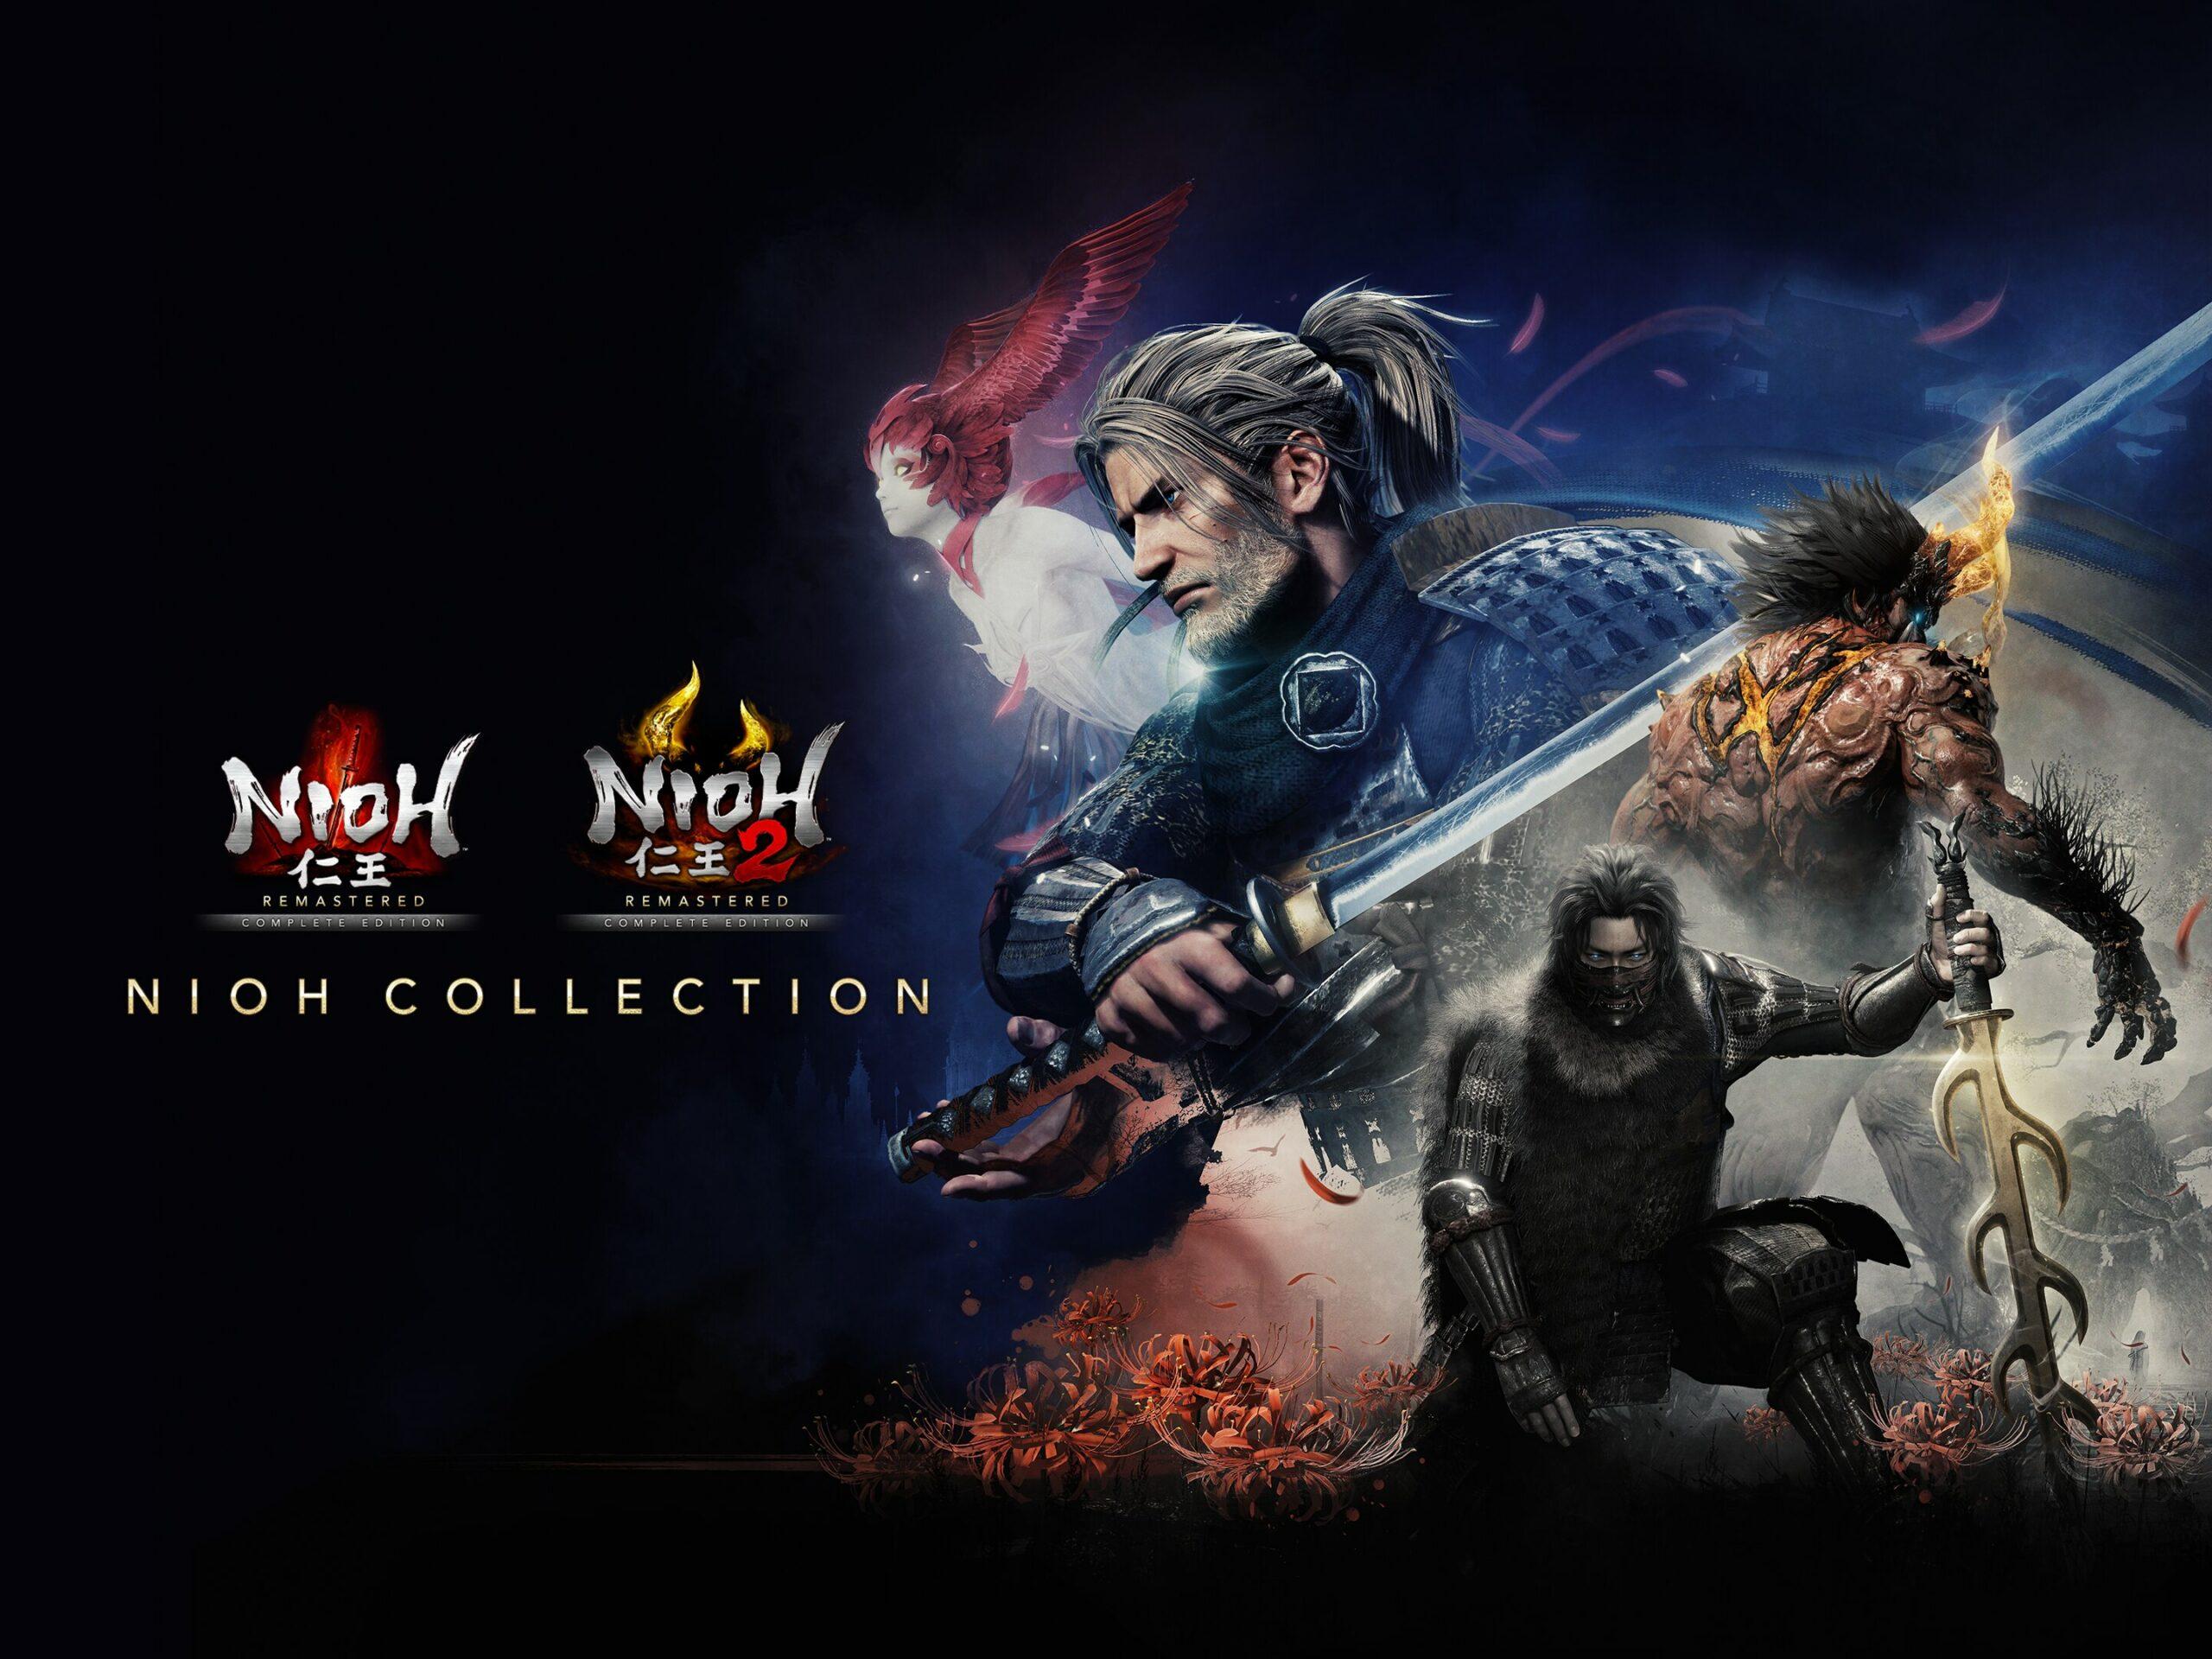 Nioh-Collection_2020_11-19-20_011